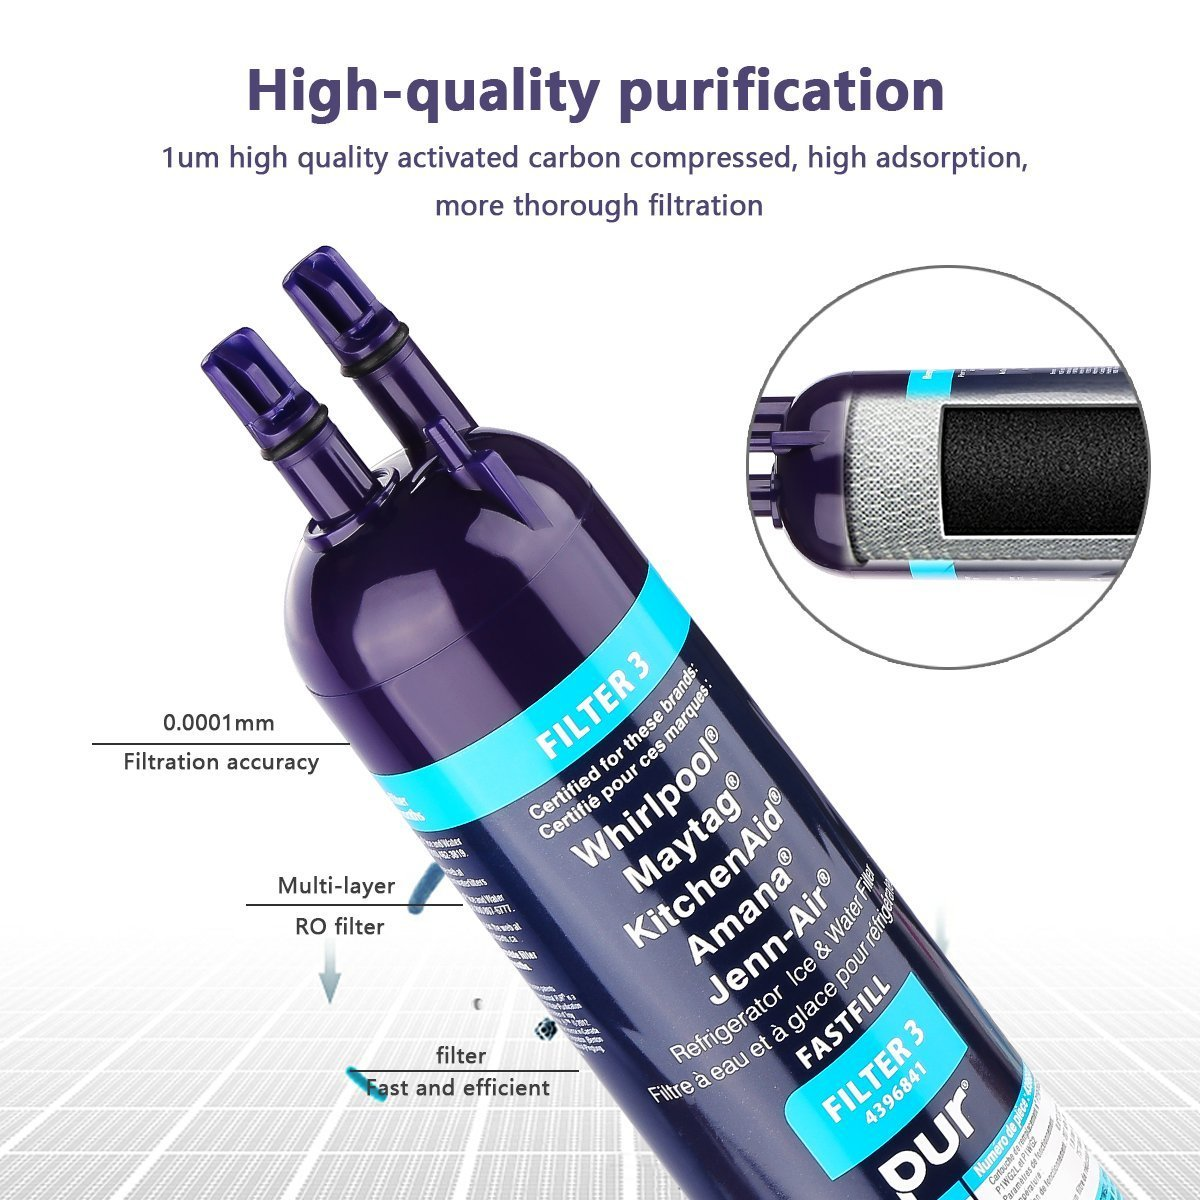 4396841 Filtro de agua para frigor/ífico KitchenAid Whirlpool por PUR